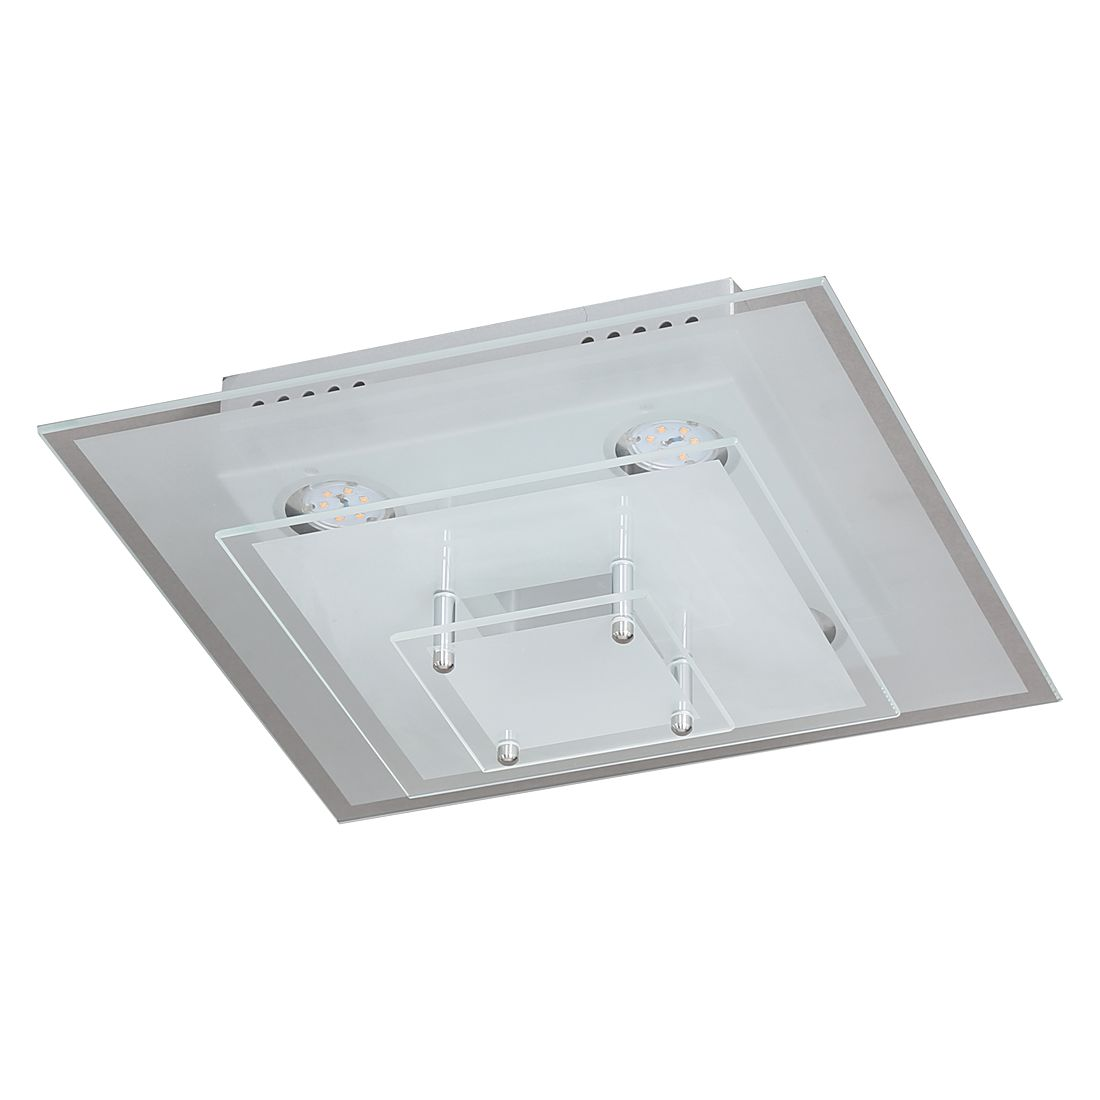 EEK A+, Deckenleuchte AIDEN – Metall/Glas – 4-flammig, Wofi bestellen